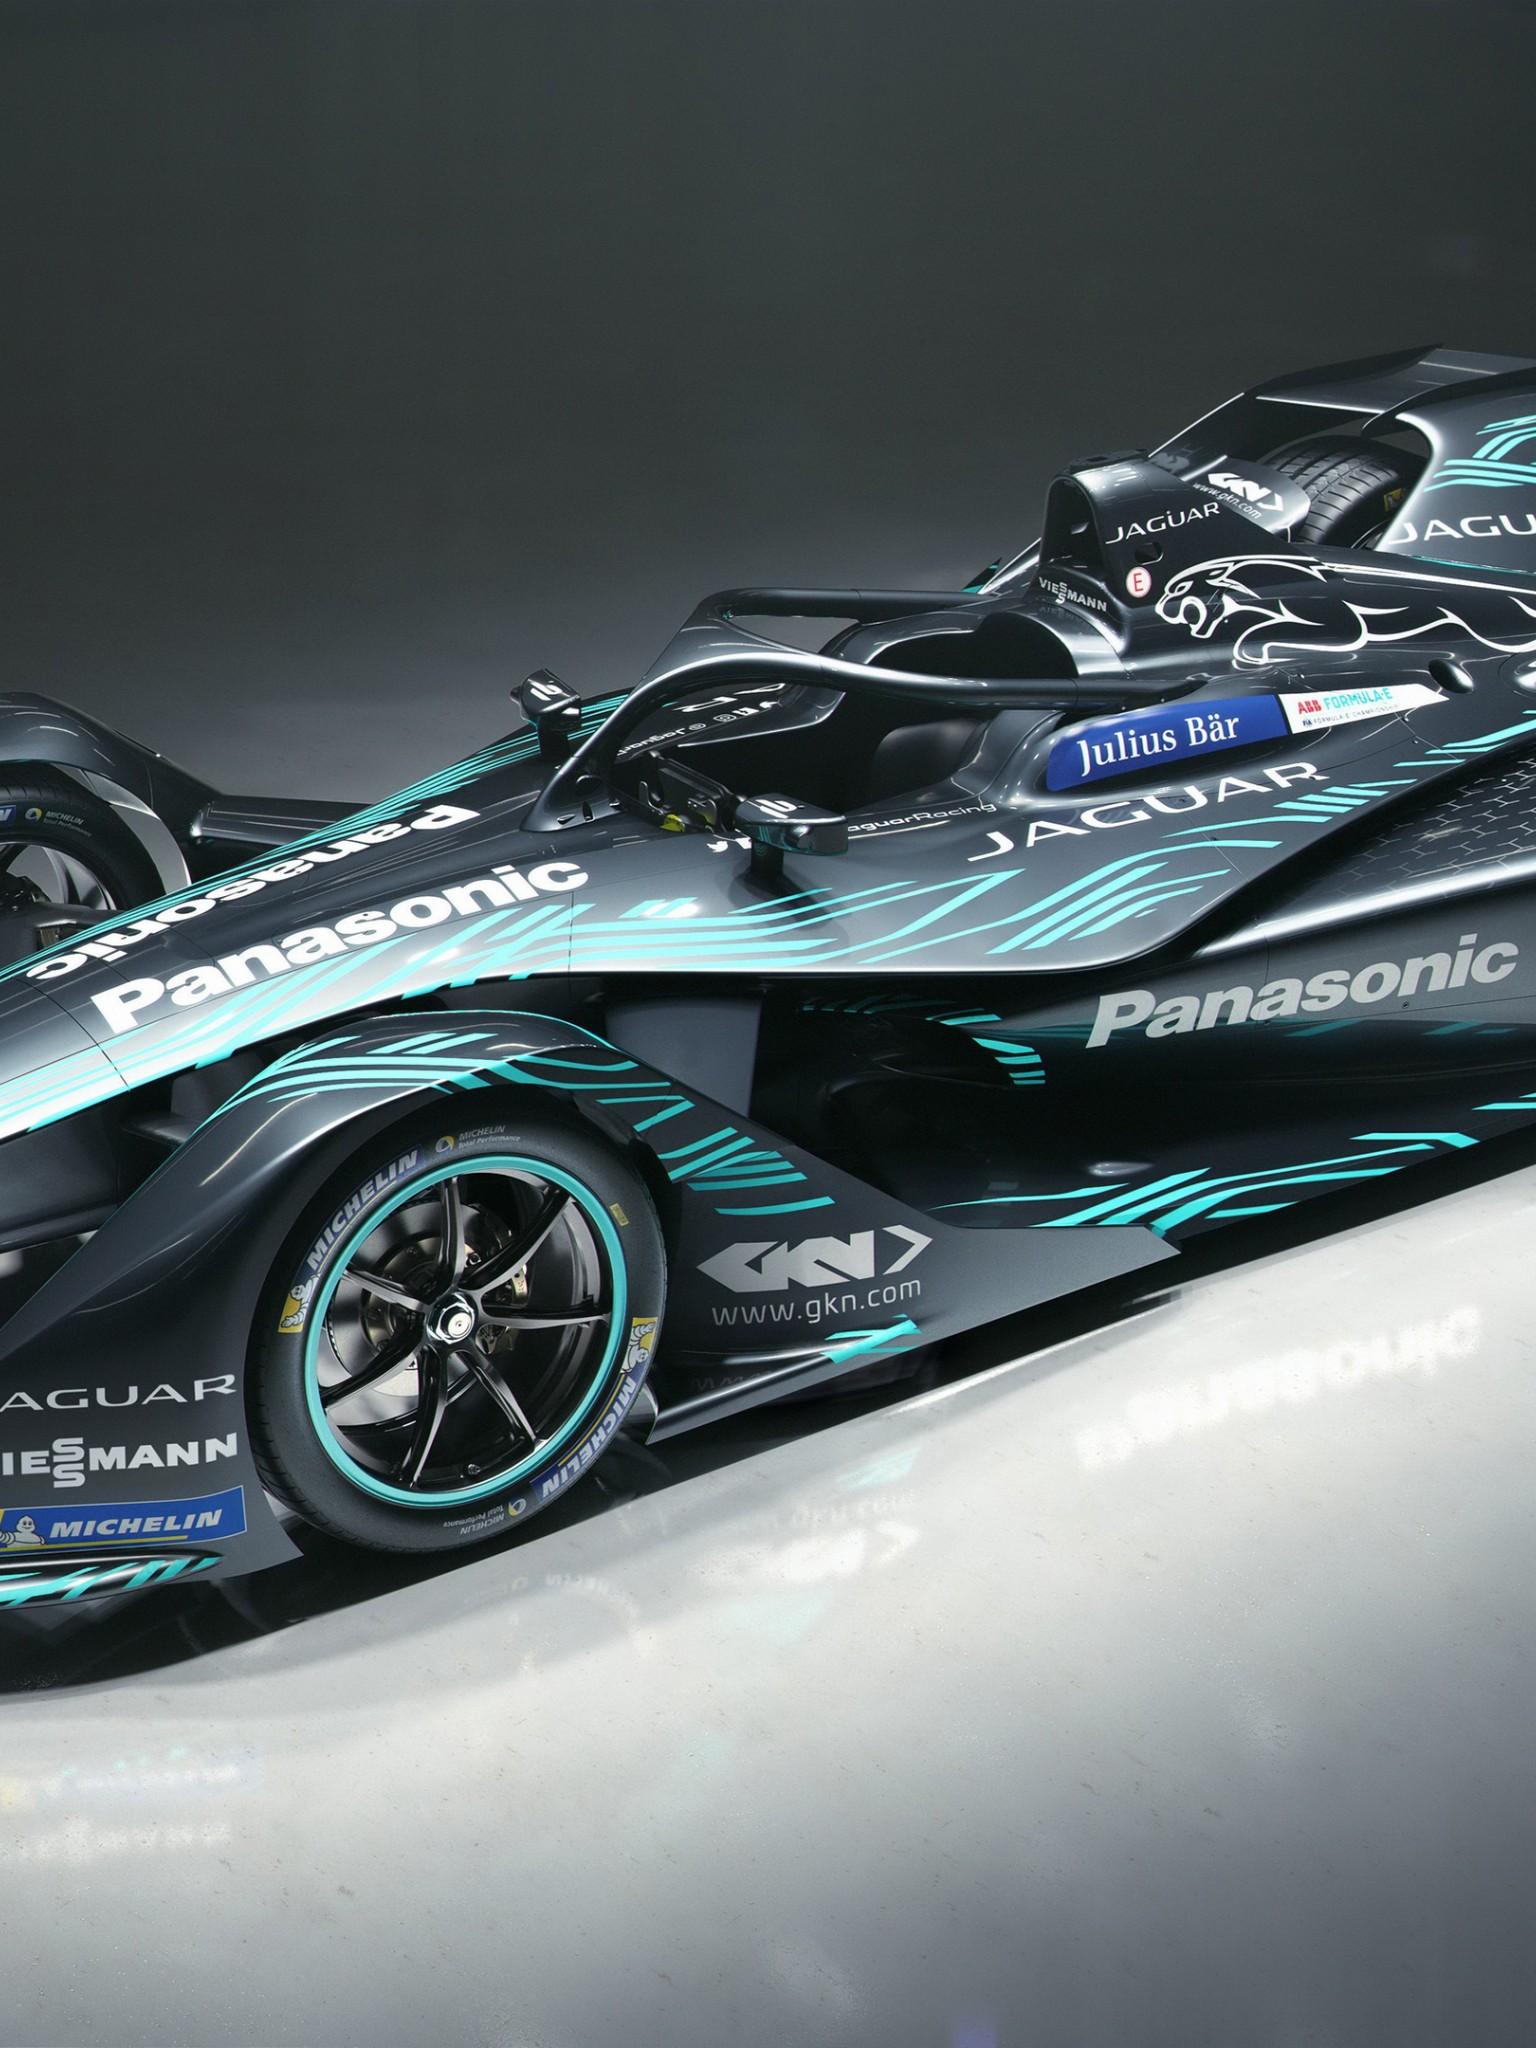 Jaguar I Type Electric Formula E Car 4K Retina IPad